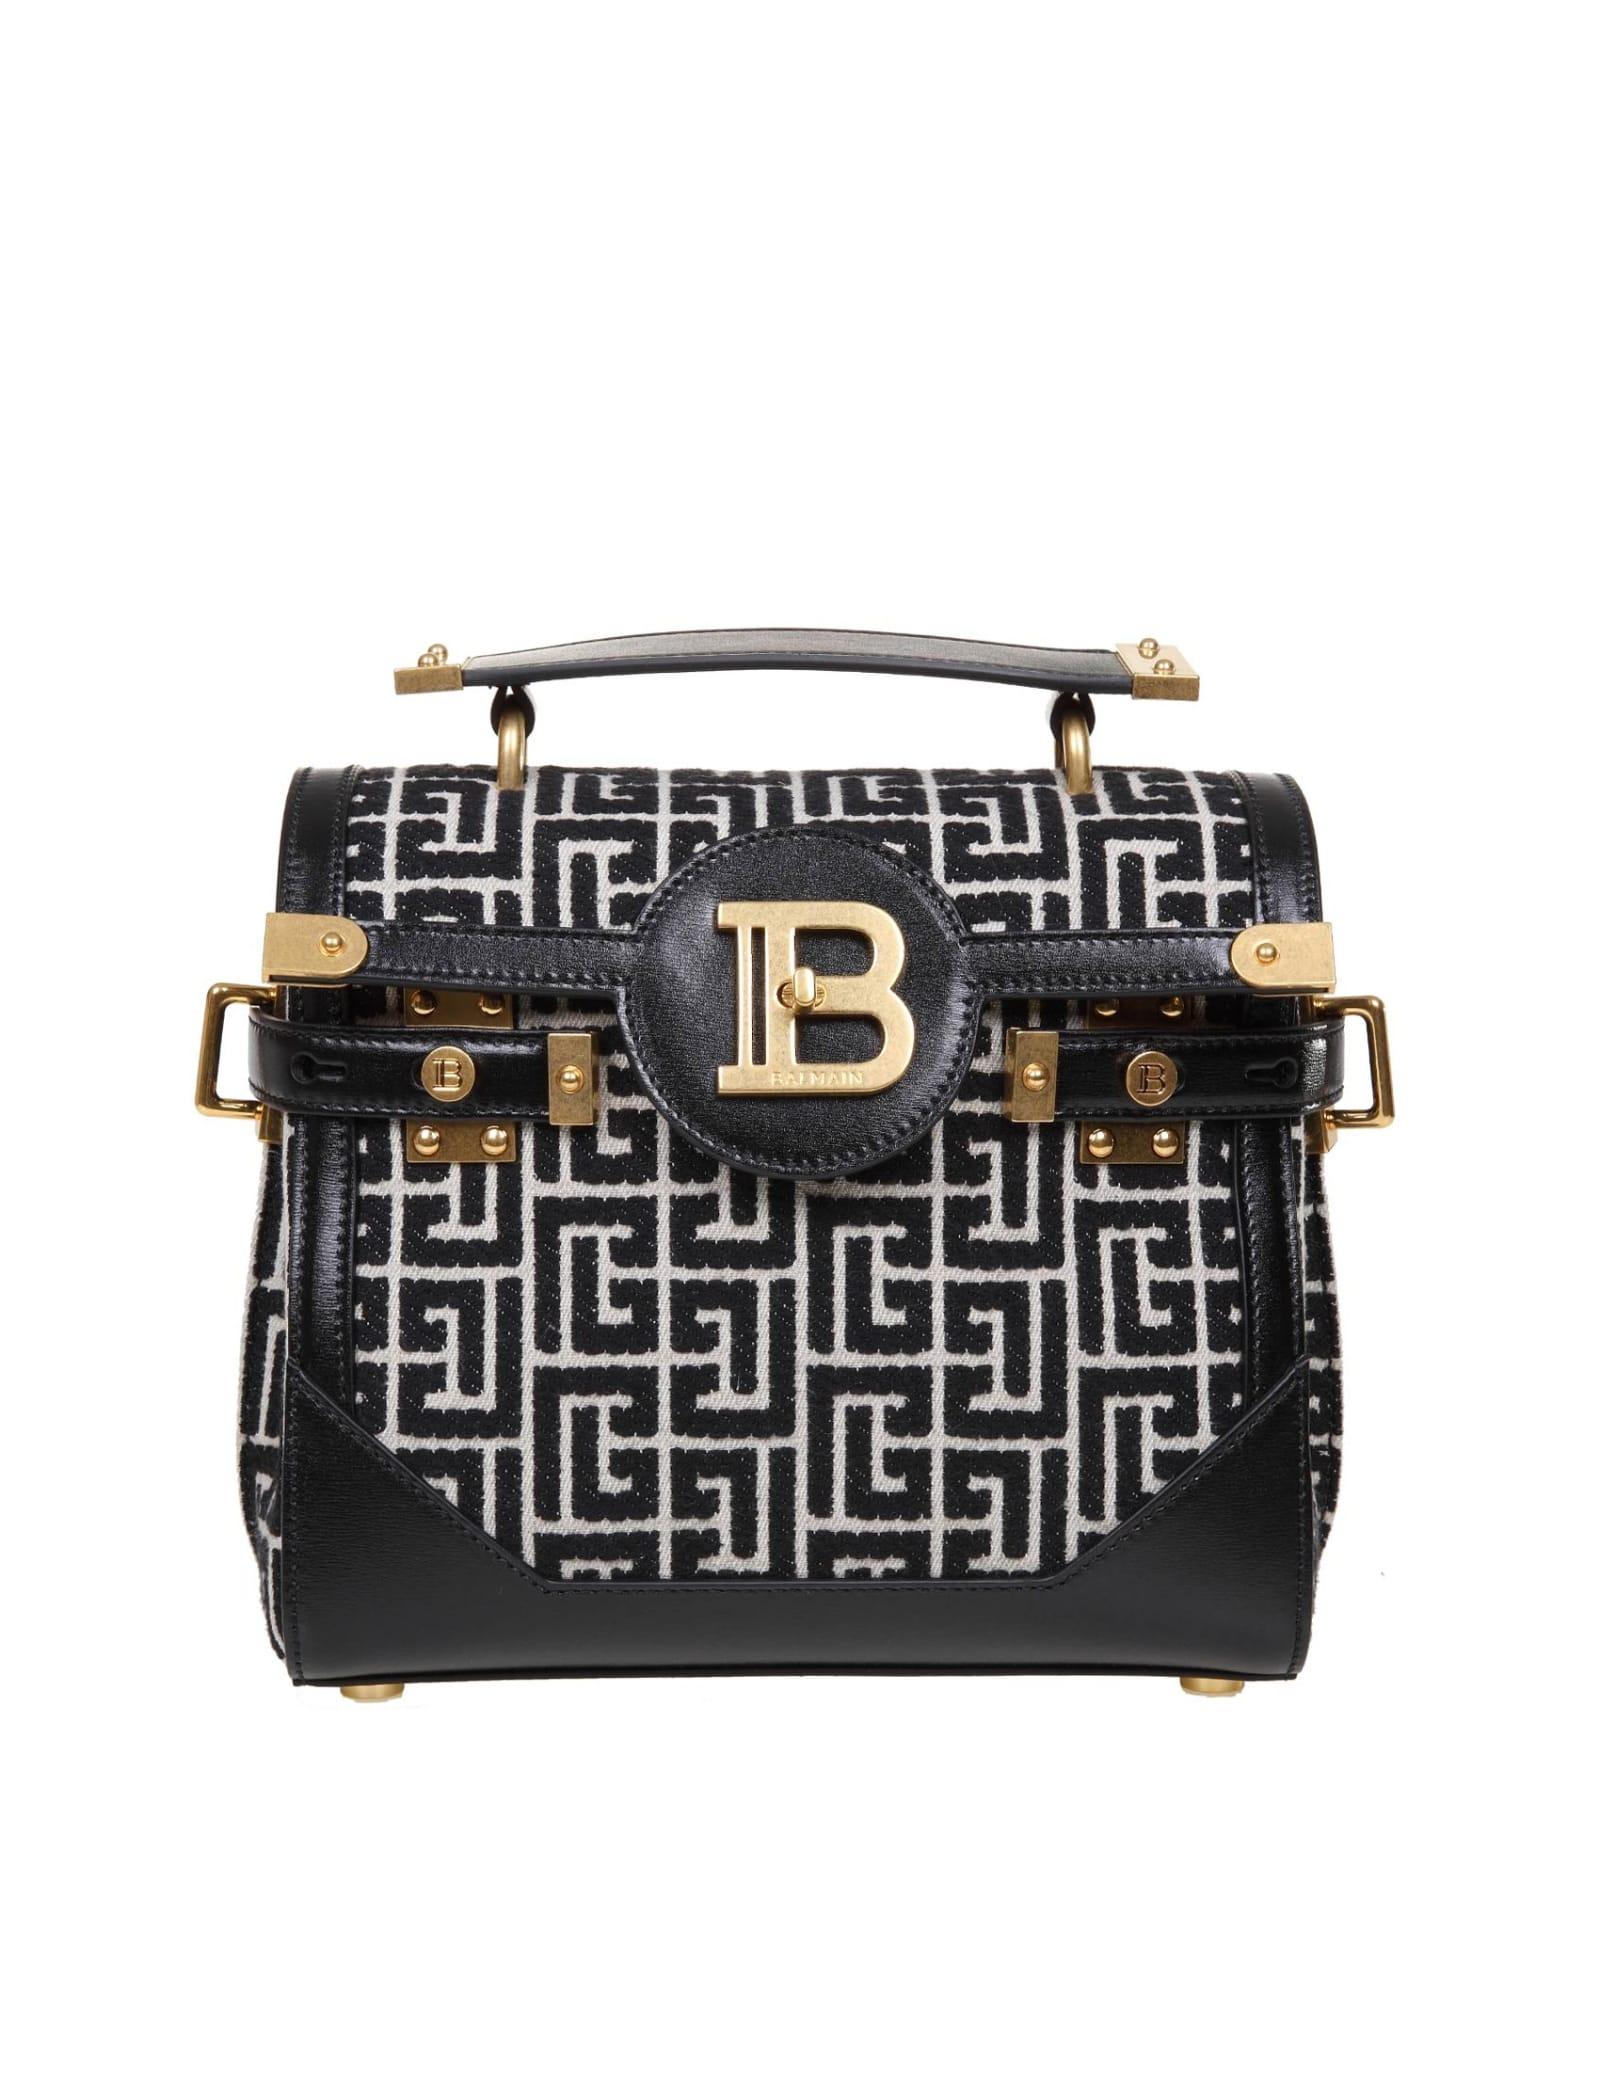 Balmain B-buzz 23 Bag In Two-tone Jacquard Leather In Black/ivory